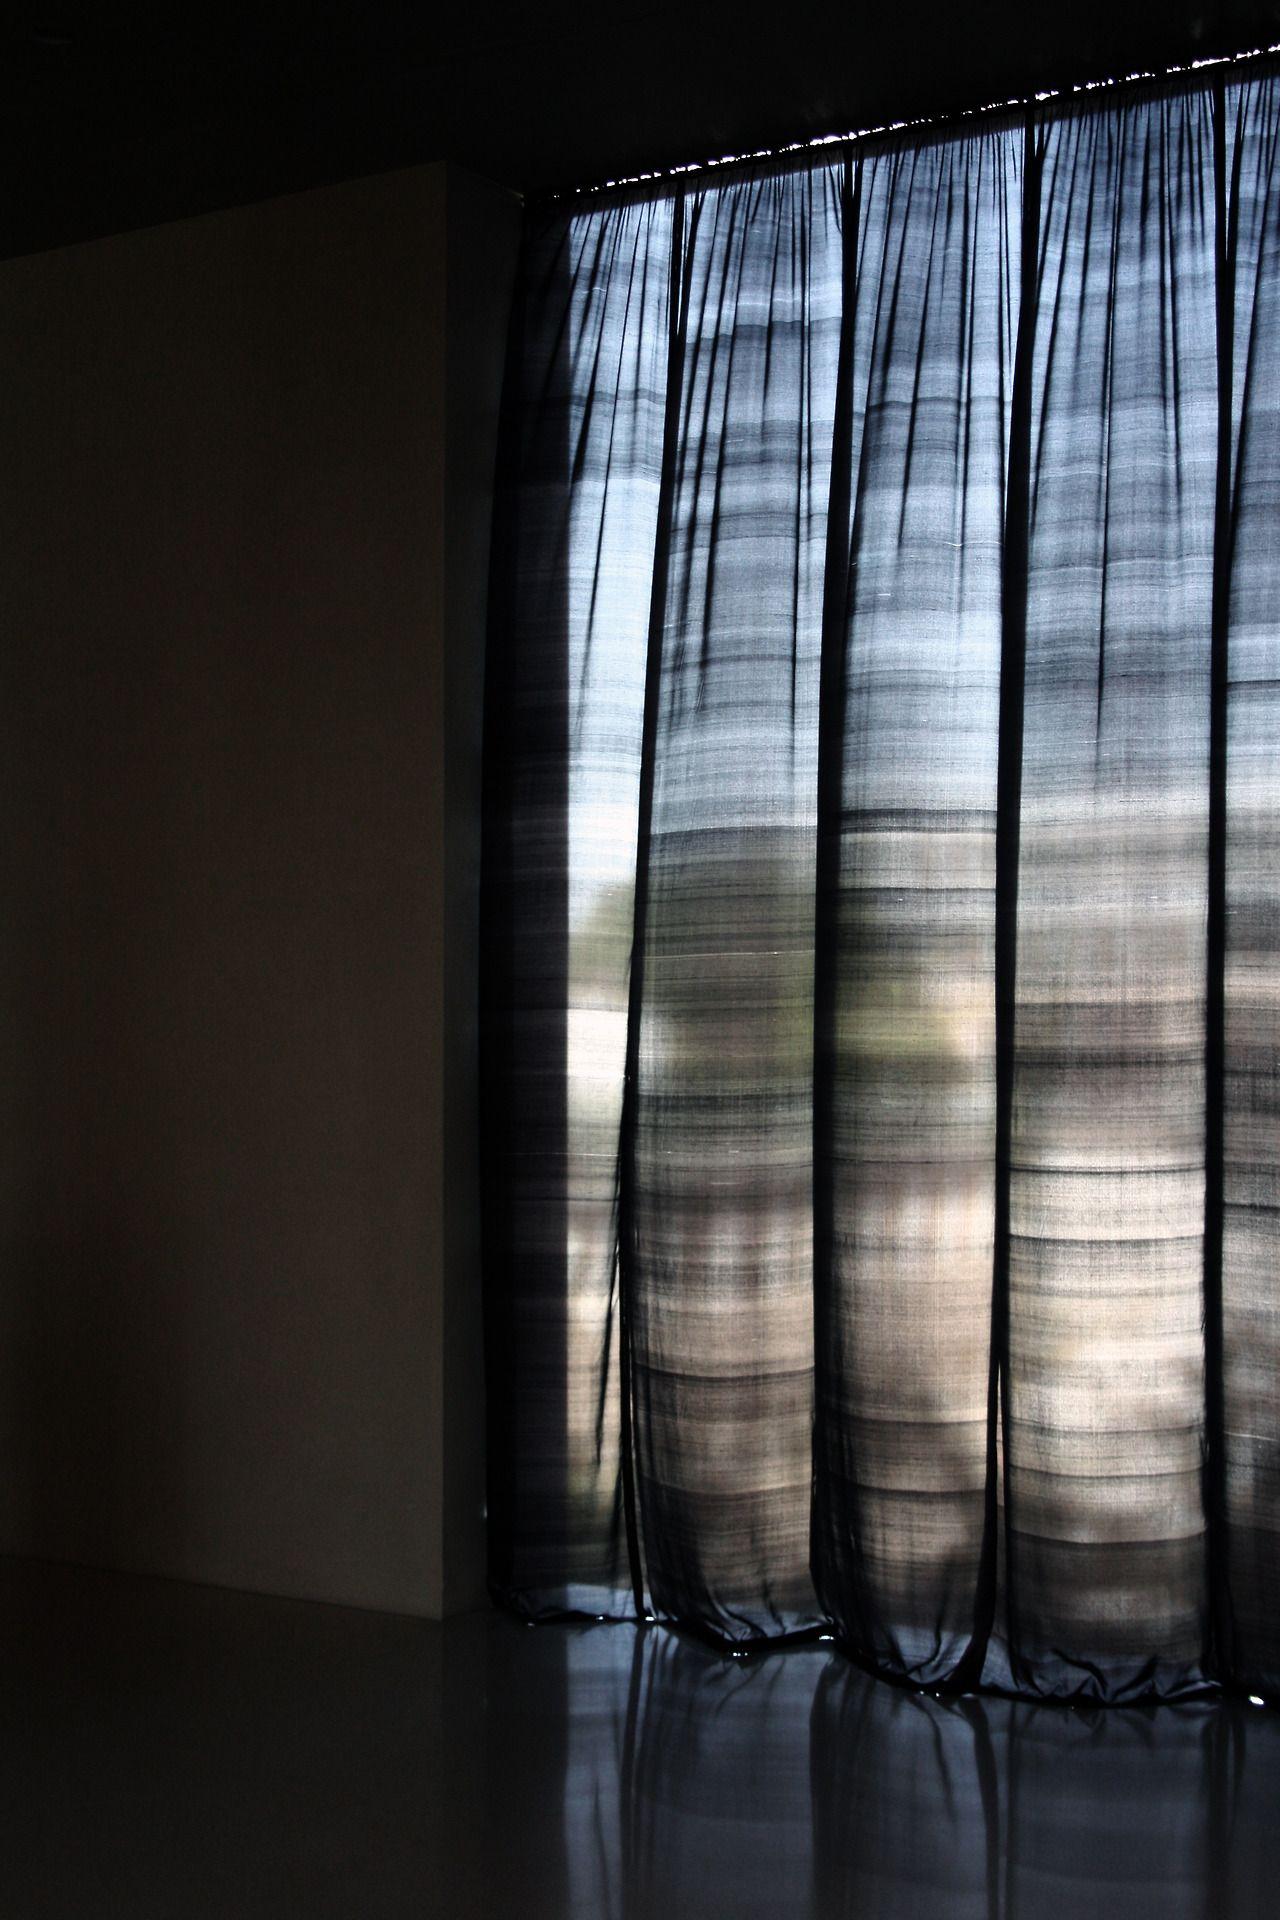 kolumba museum peter zumthor home peter zumthor curtains curtain designs. Black Bedroom Furniture Sets. Home Design Ideas